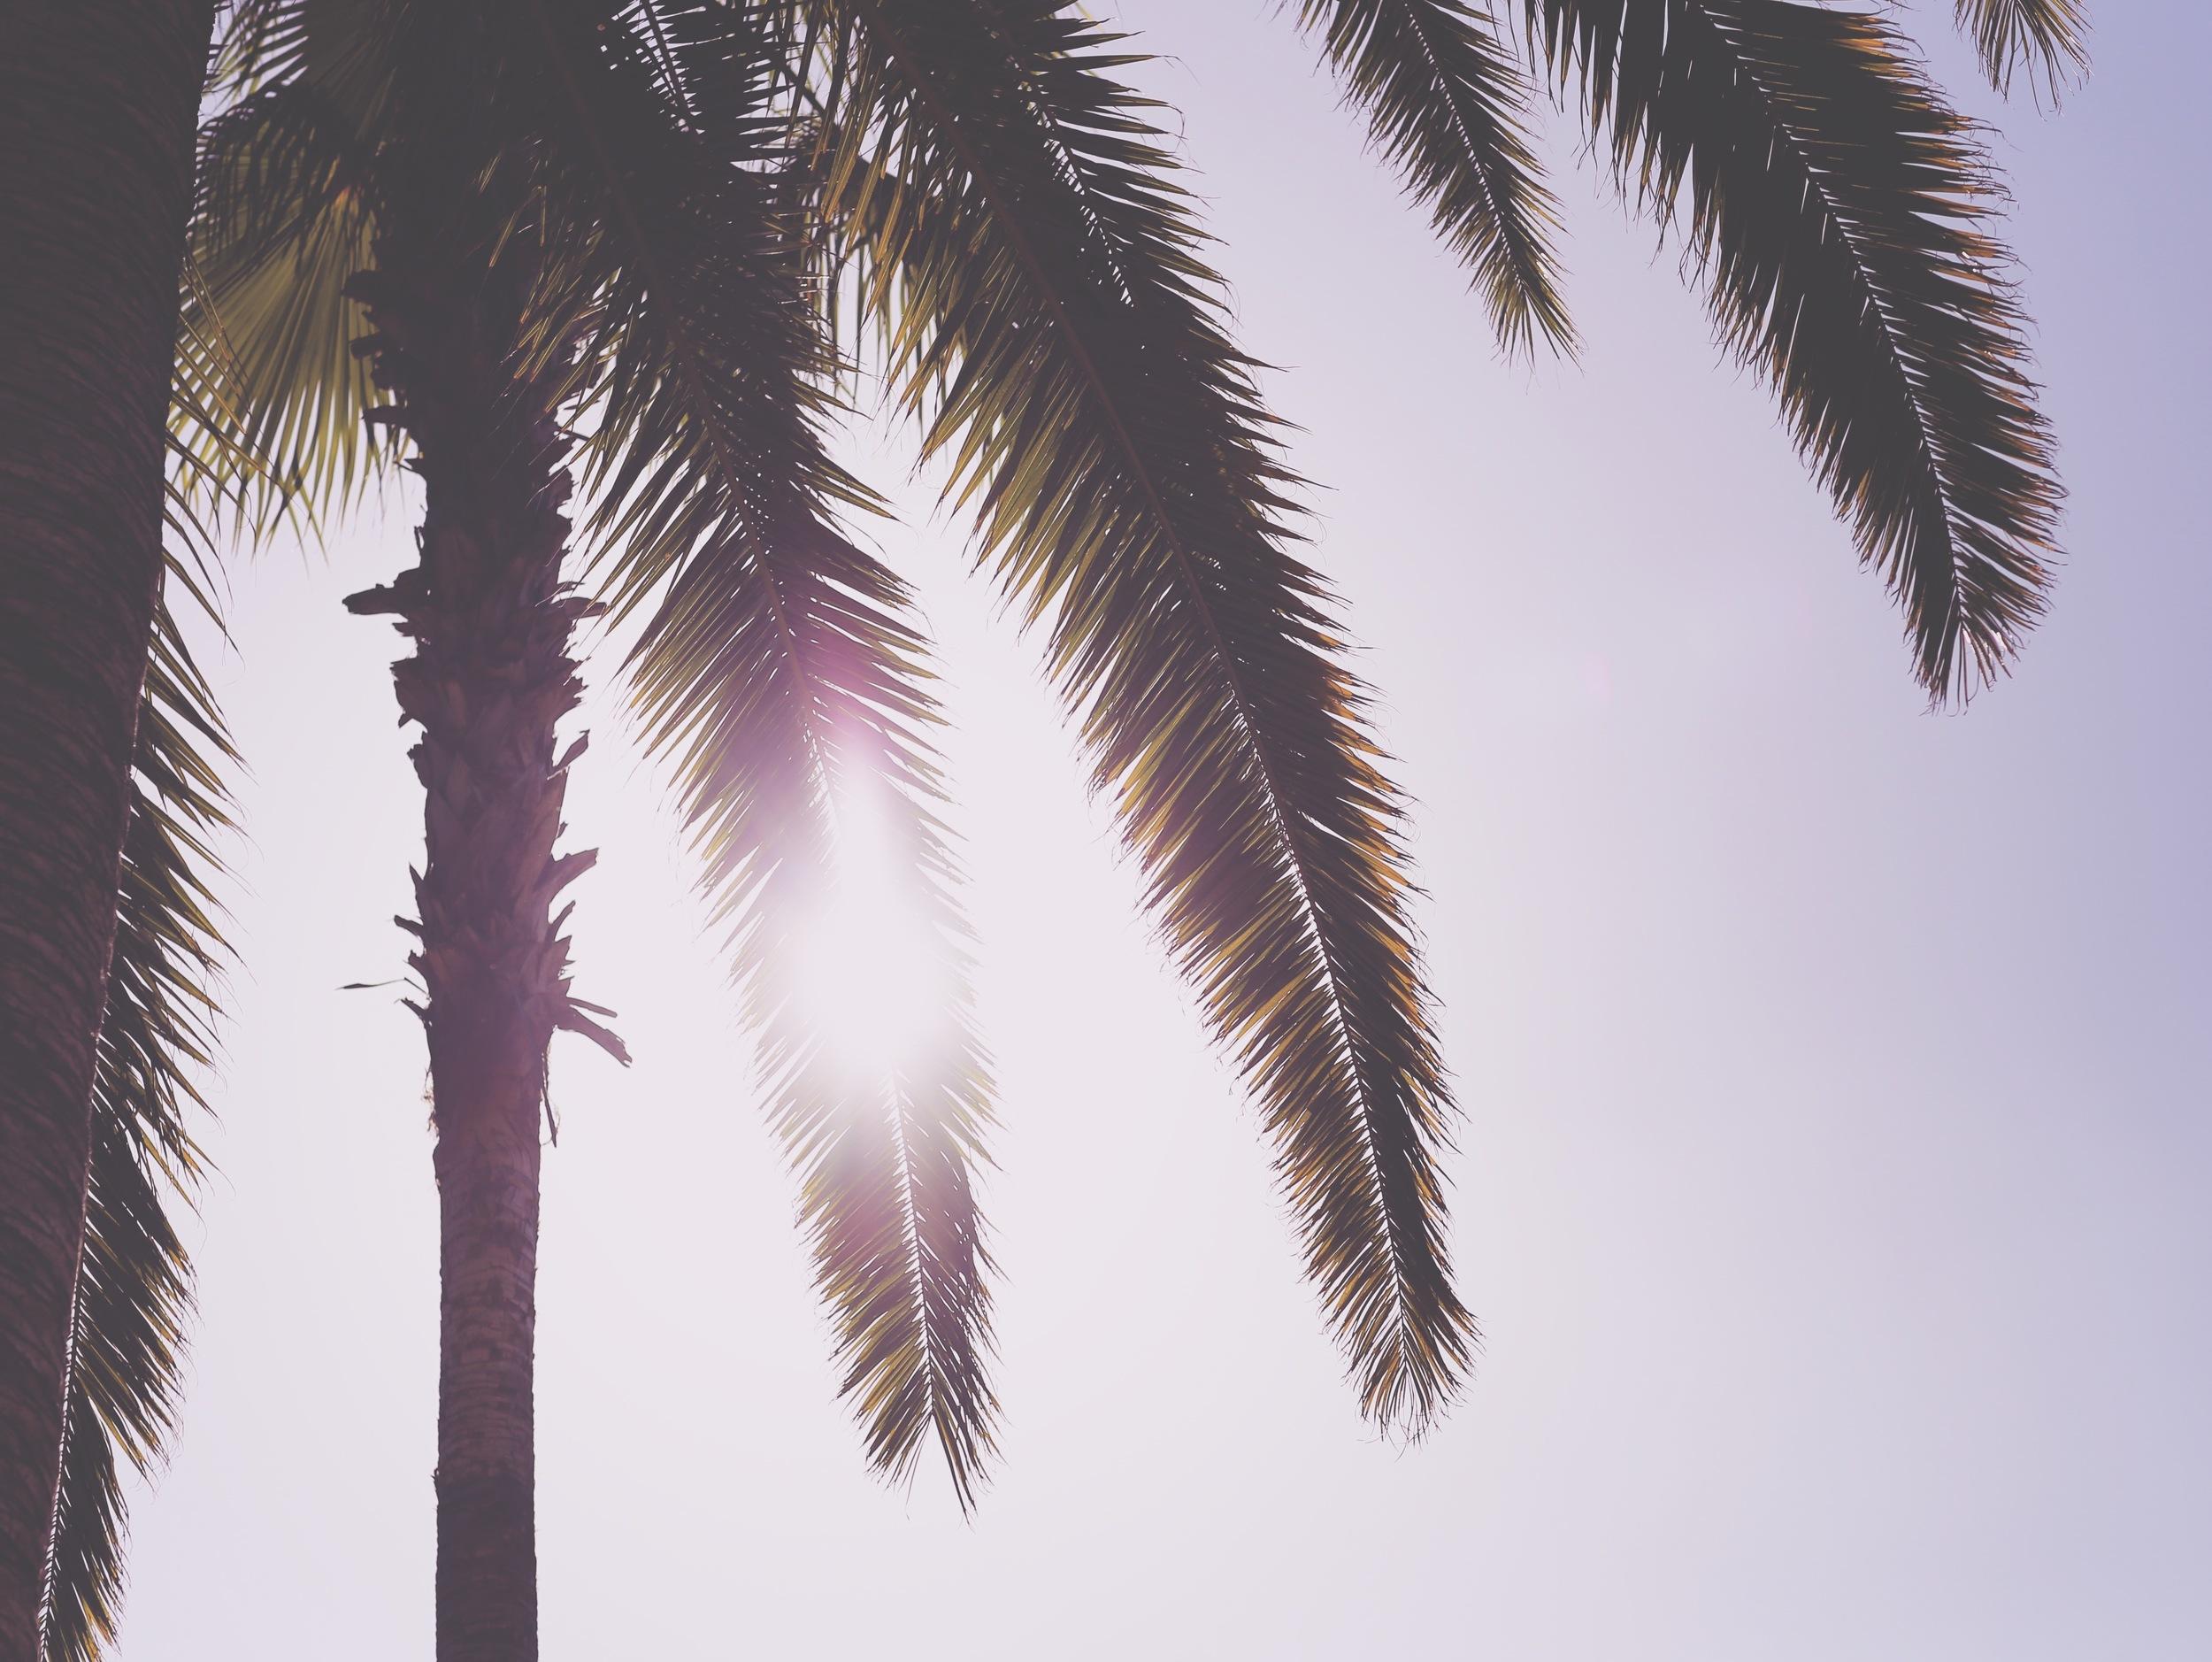 Sunlight Through Palm Branches